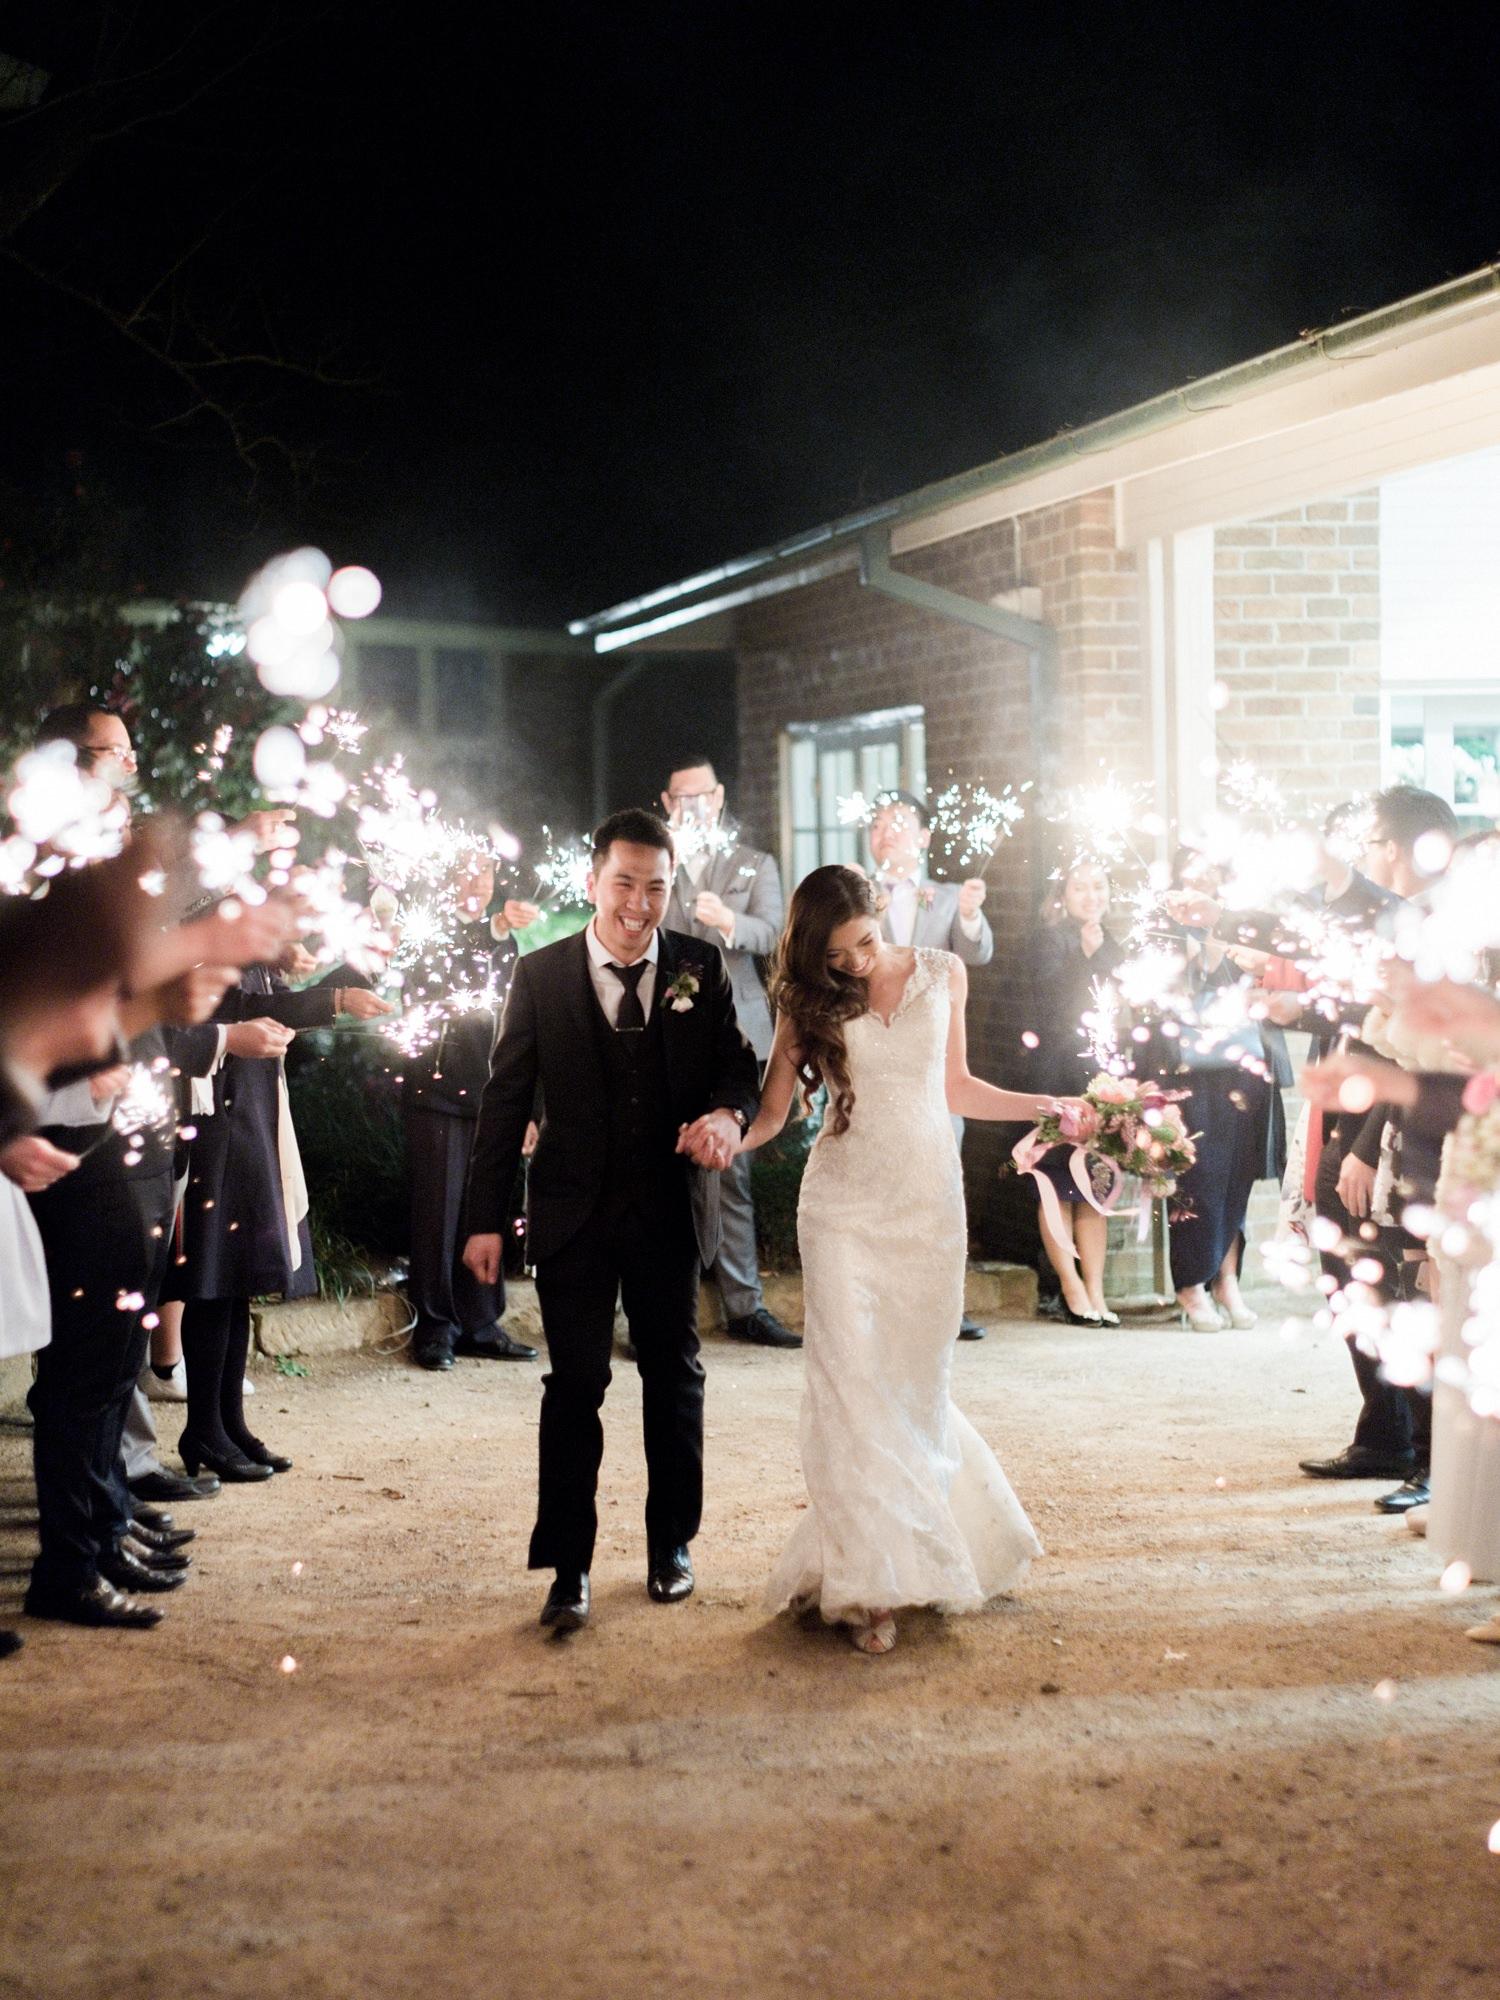 Somphors&dong-wedding-0987.jpg